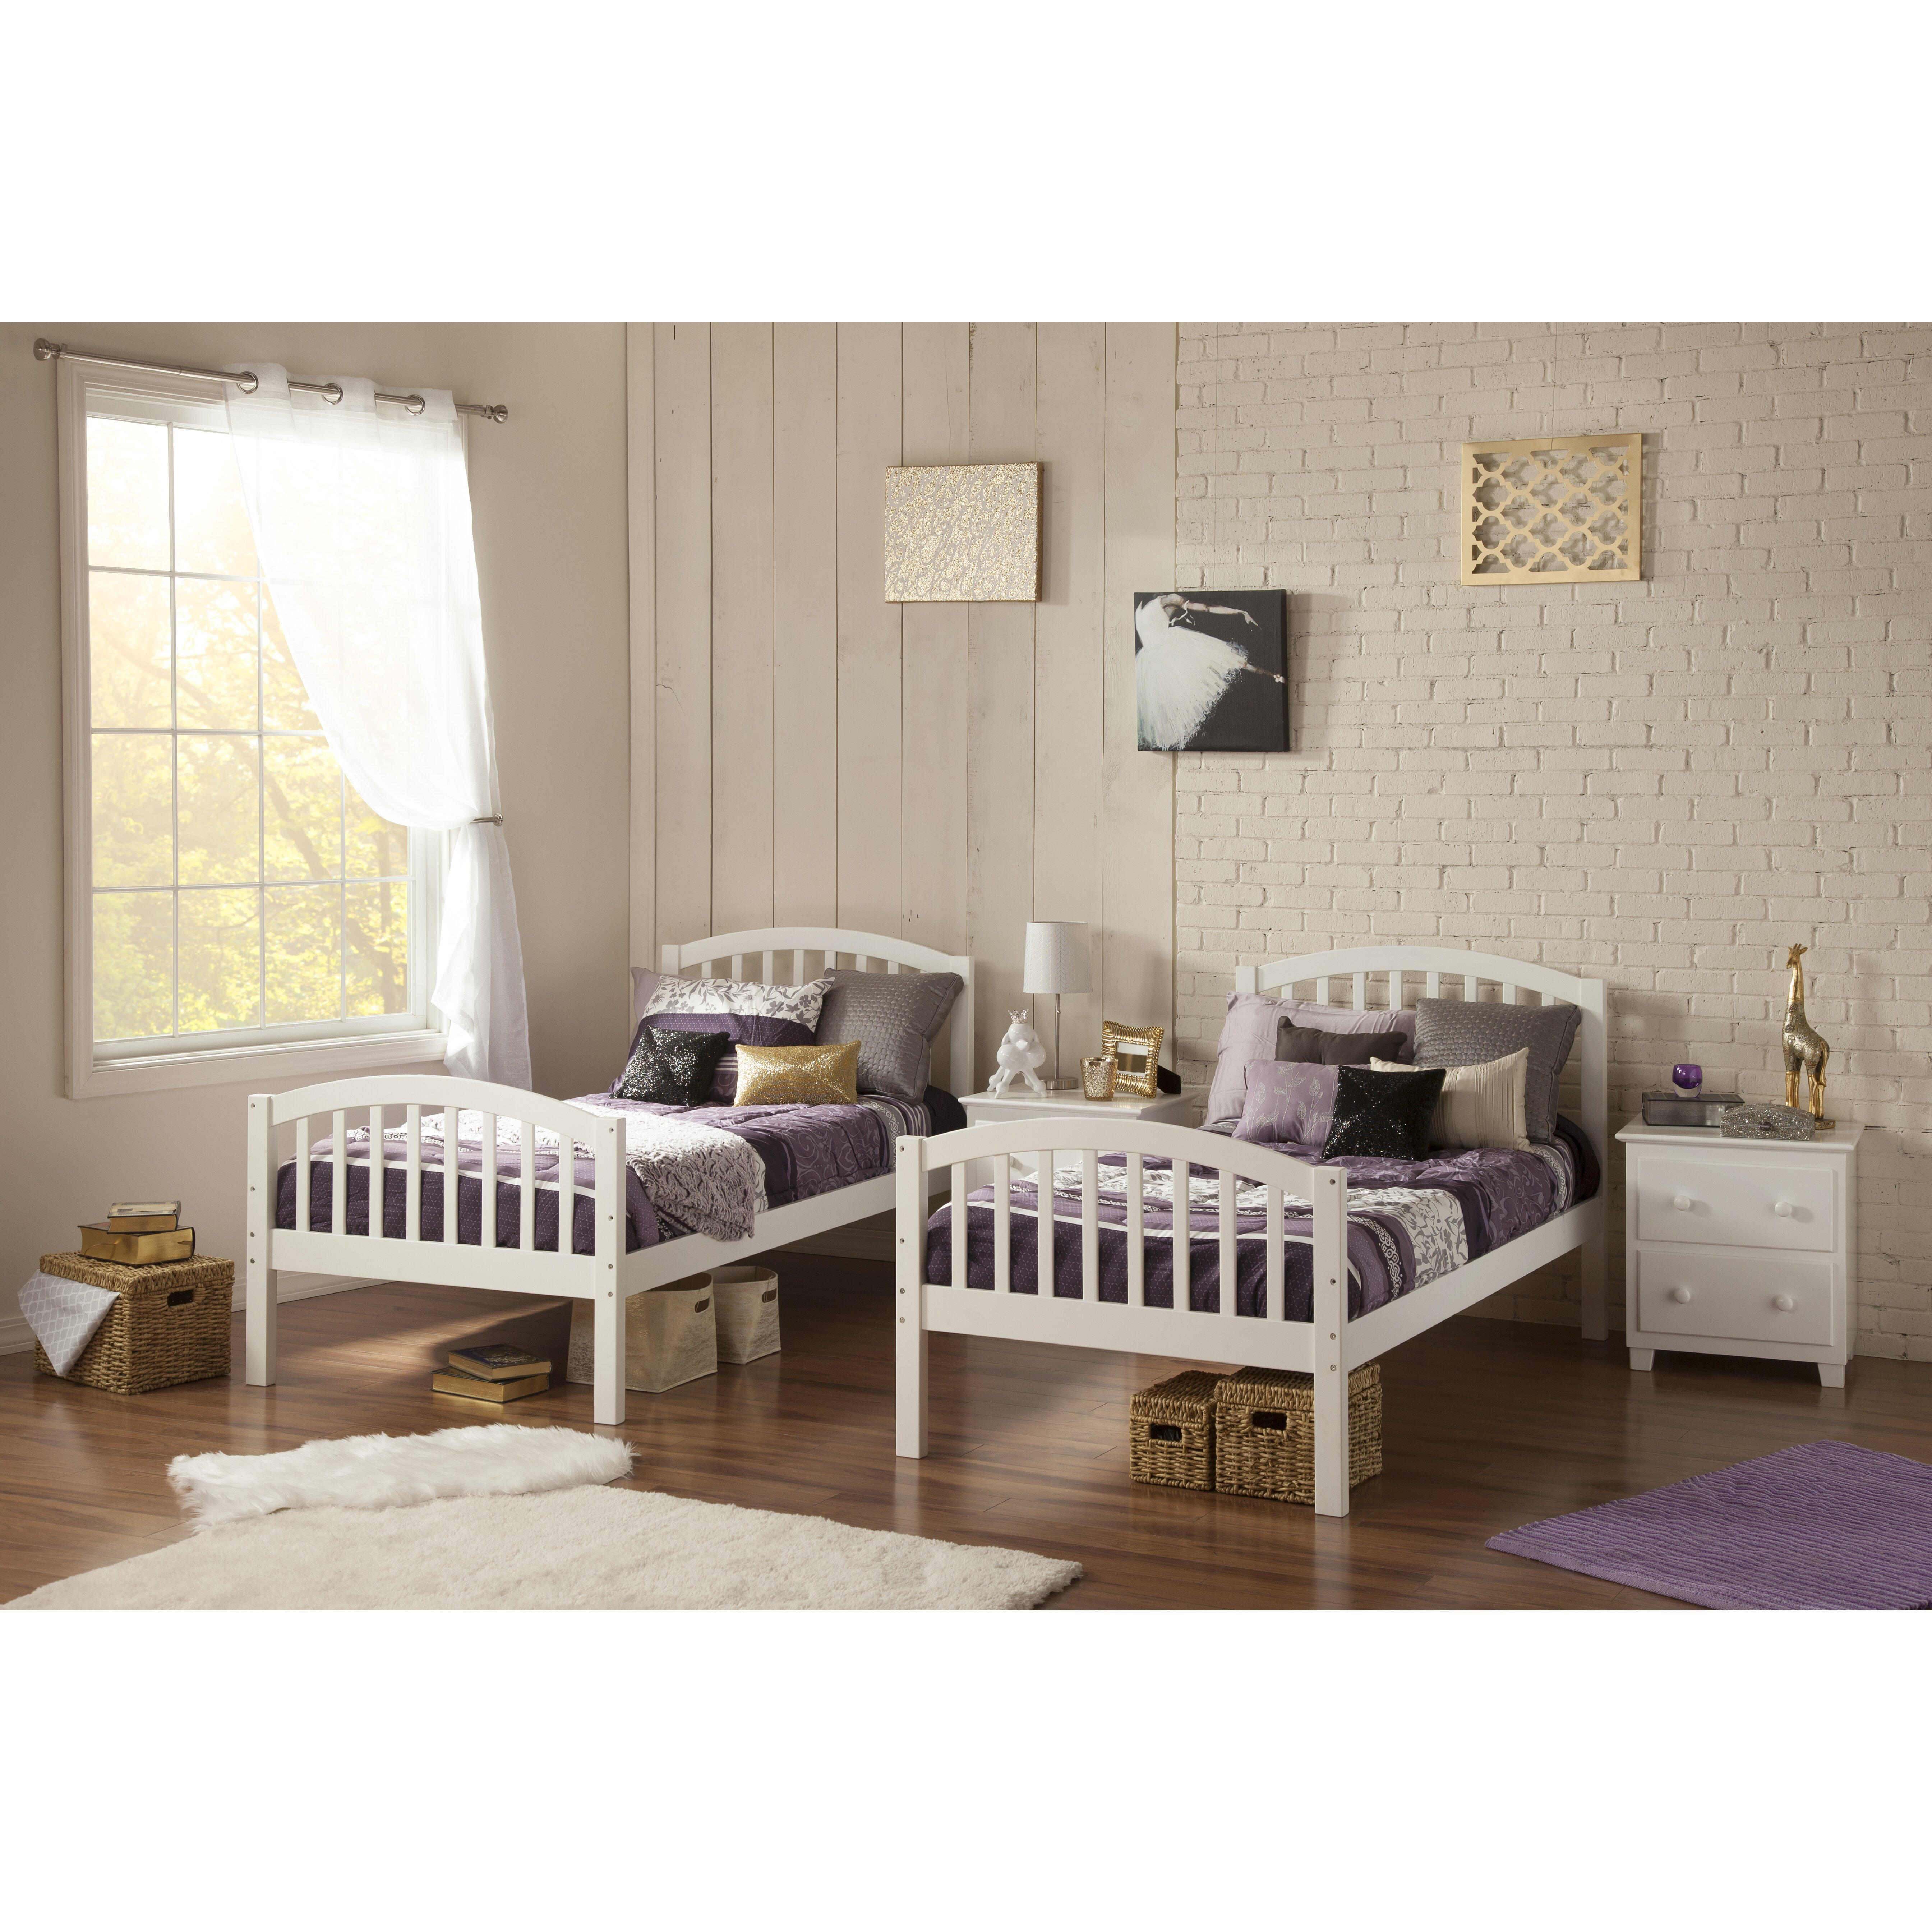 Atlantic Furniture Richland Twin Over Full Bunk Bed Atlantic Furniture  Richland Twin Over Full Bunk With Atlantic Furniture